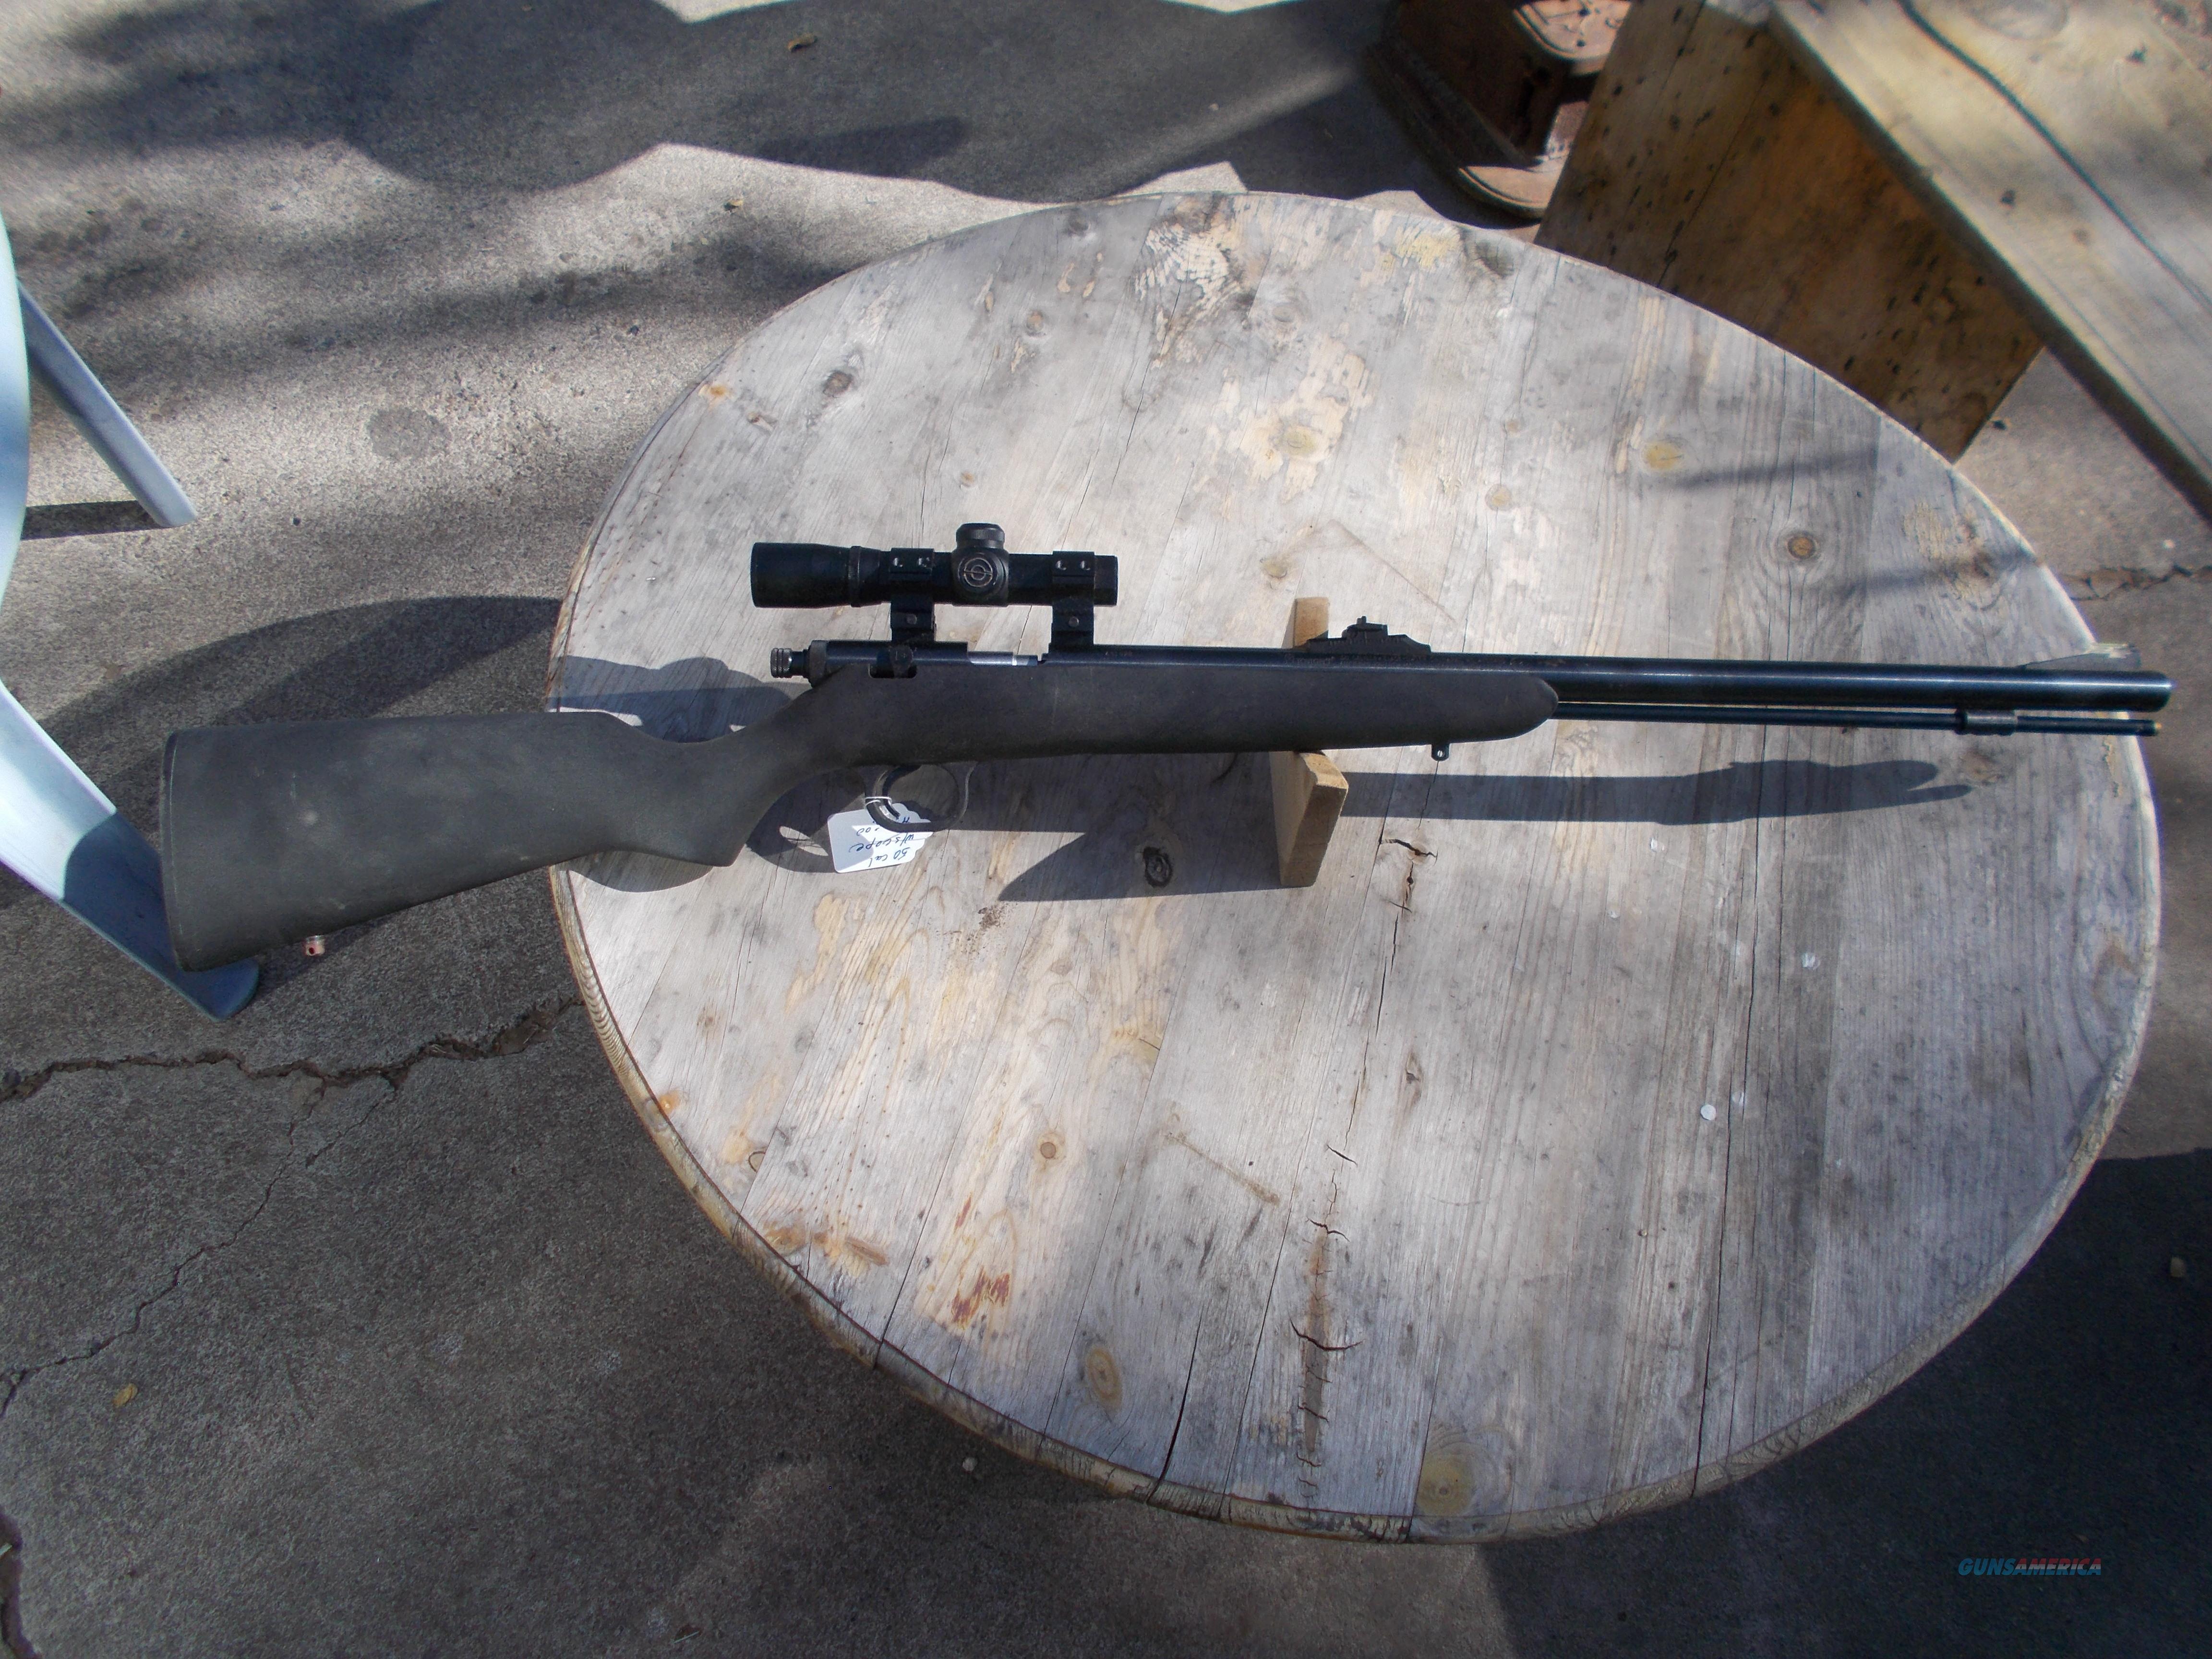 knight 50 cal muzzle loader w/scope  Guns > Rifles > Knight's Manufacturing Rifles